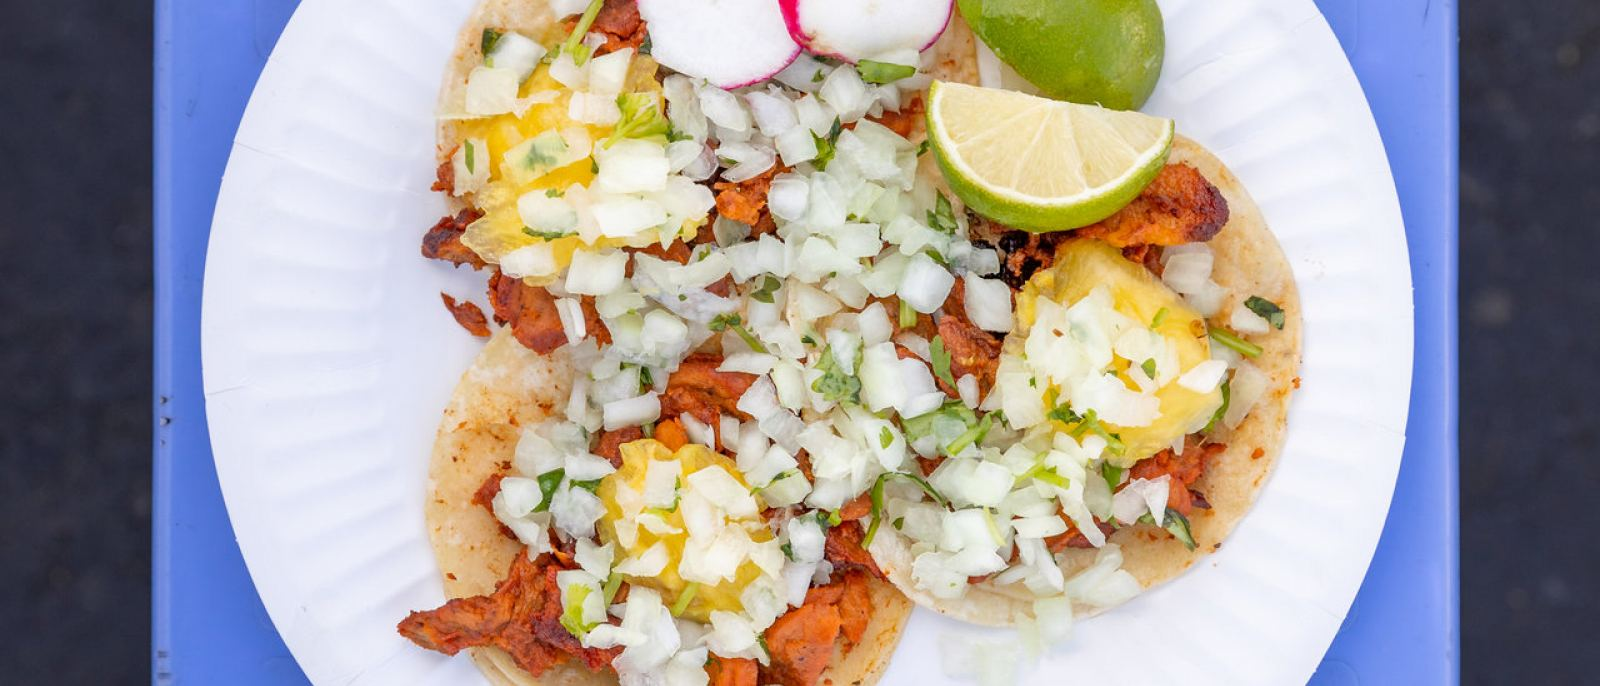 leo's tacos al pastor